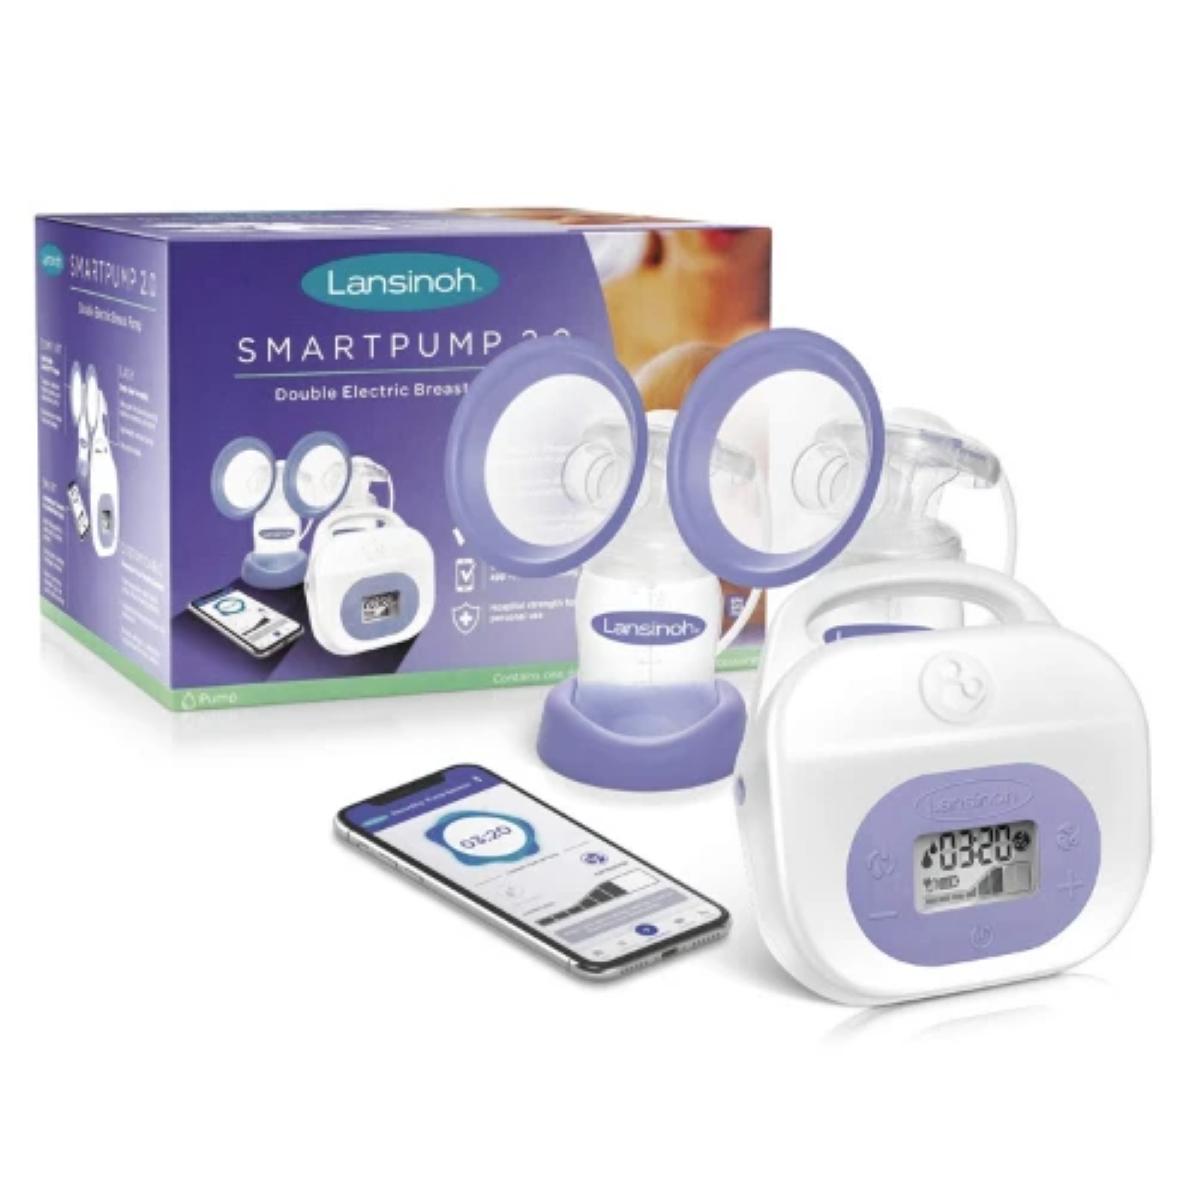 Lansinoh Smartpump 2.0's Package